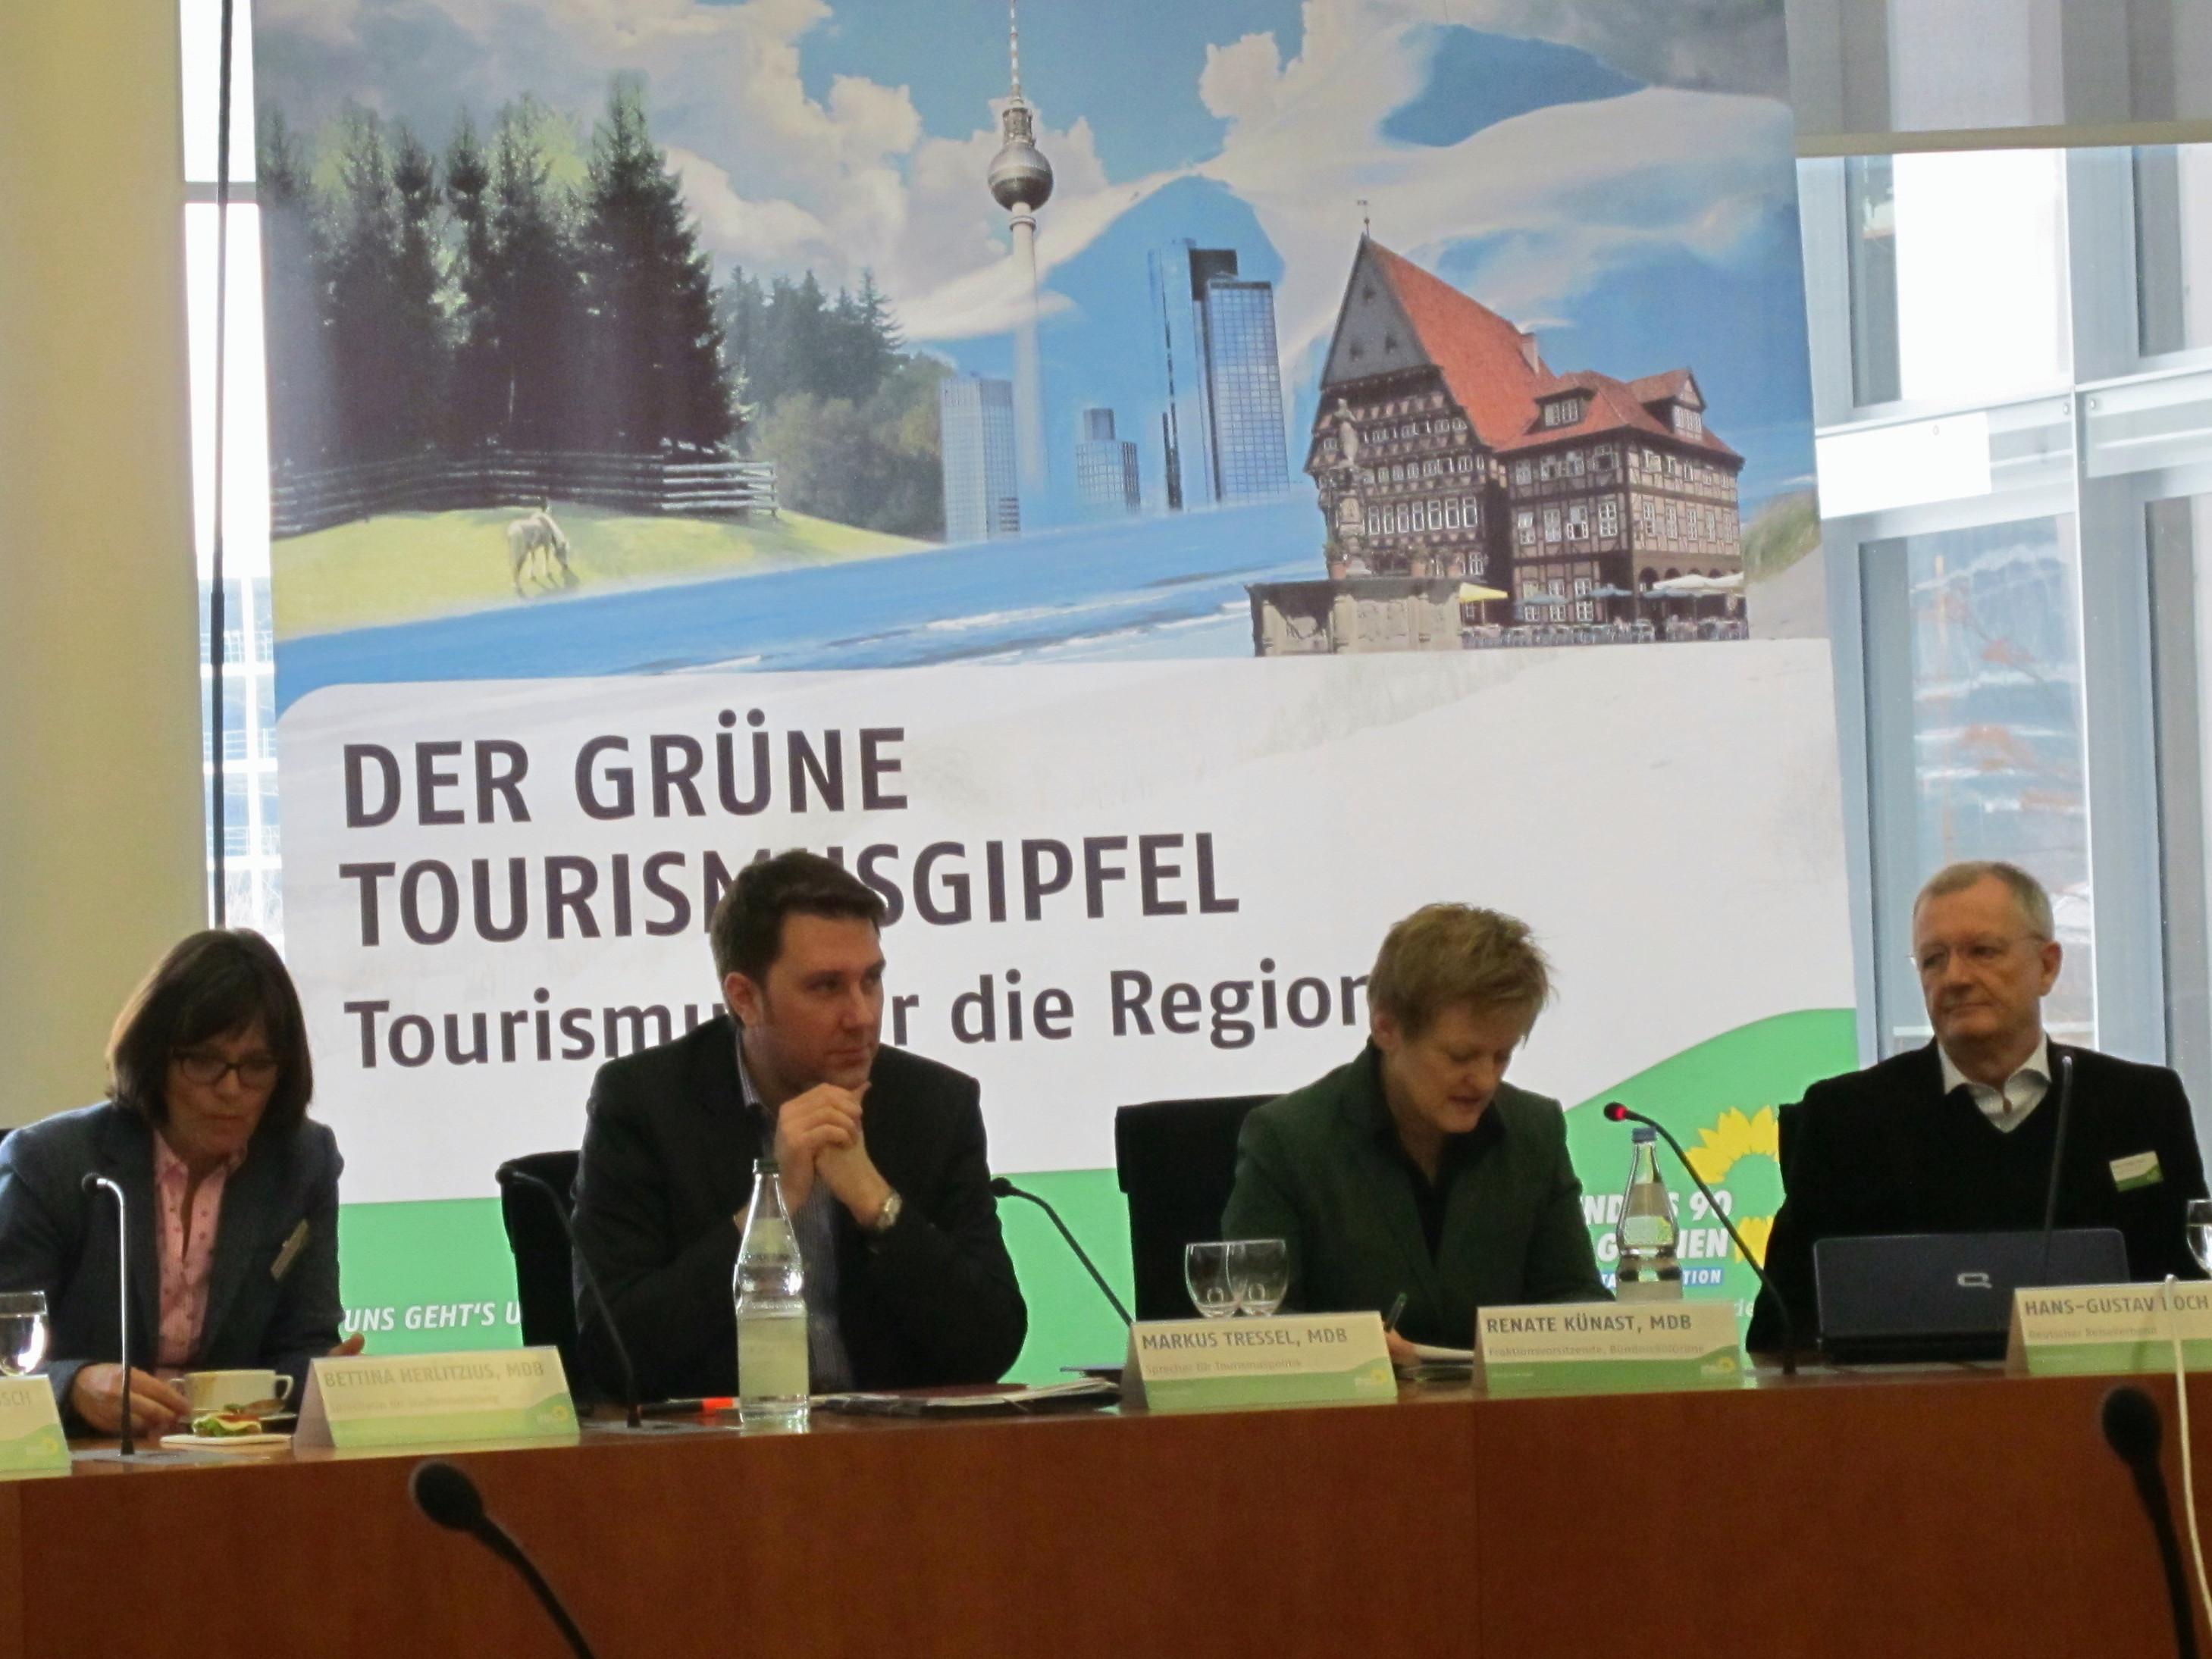 2. Grüner Tourismusgipfel